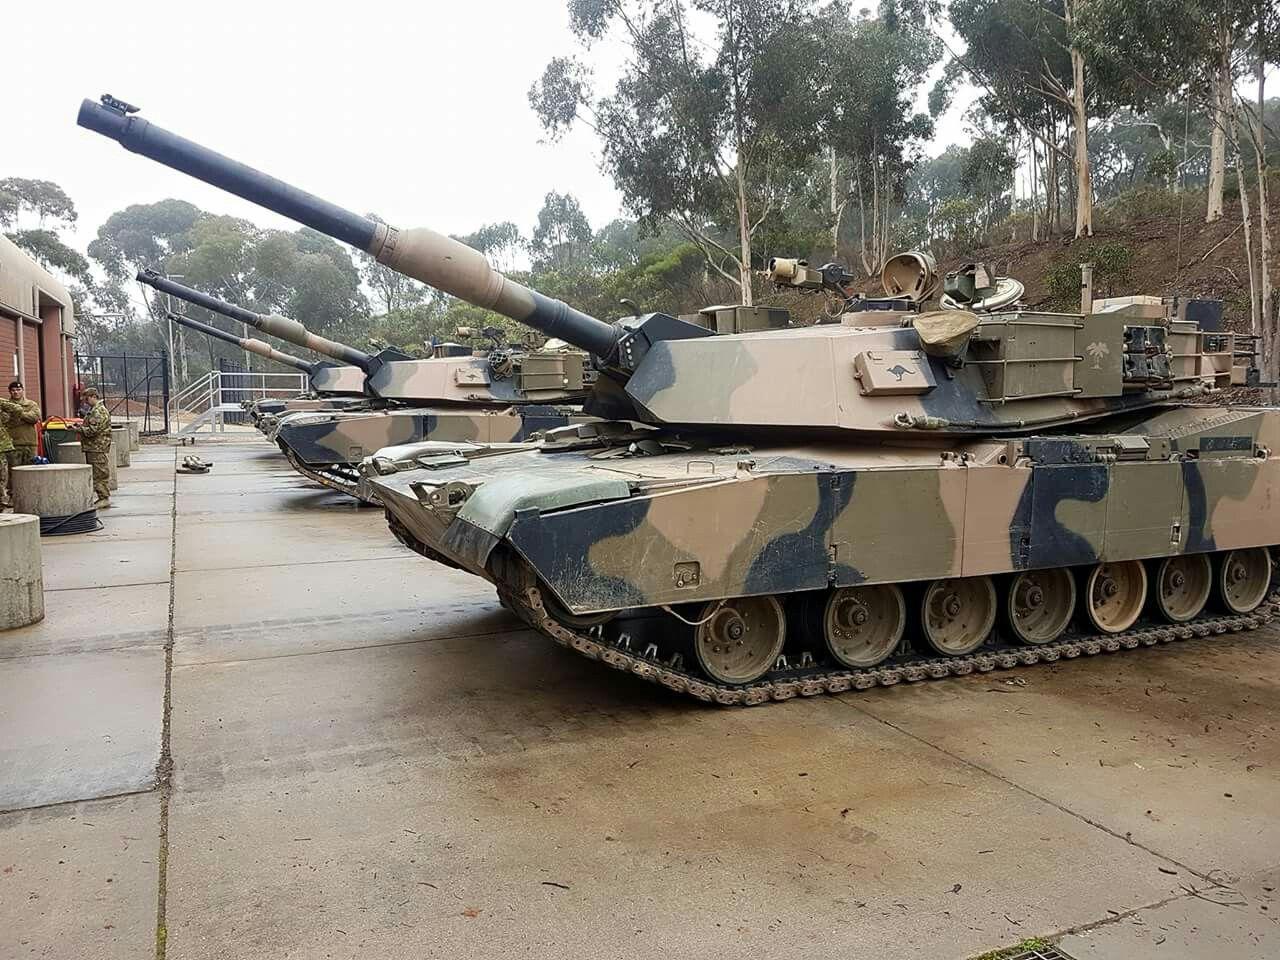 Pin by Giga Moseshvili on Tanks | Army vehicles, Military